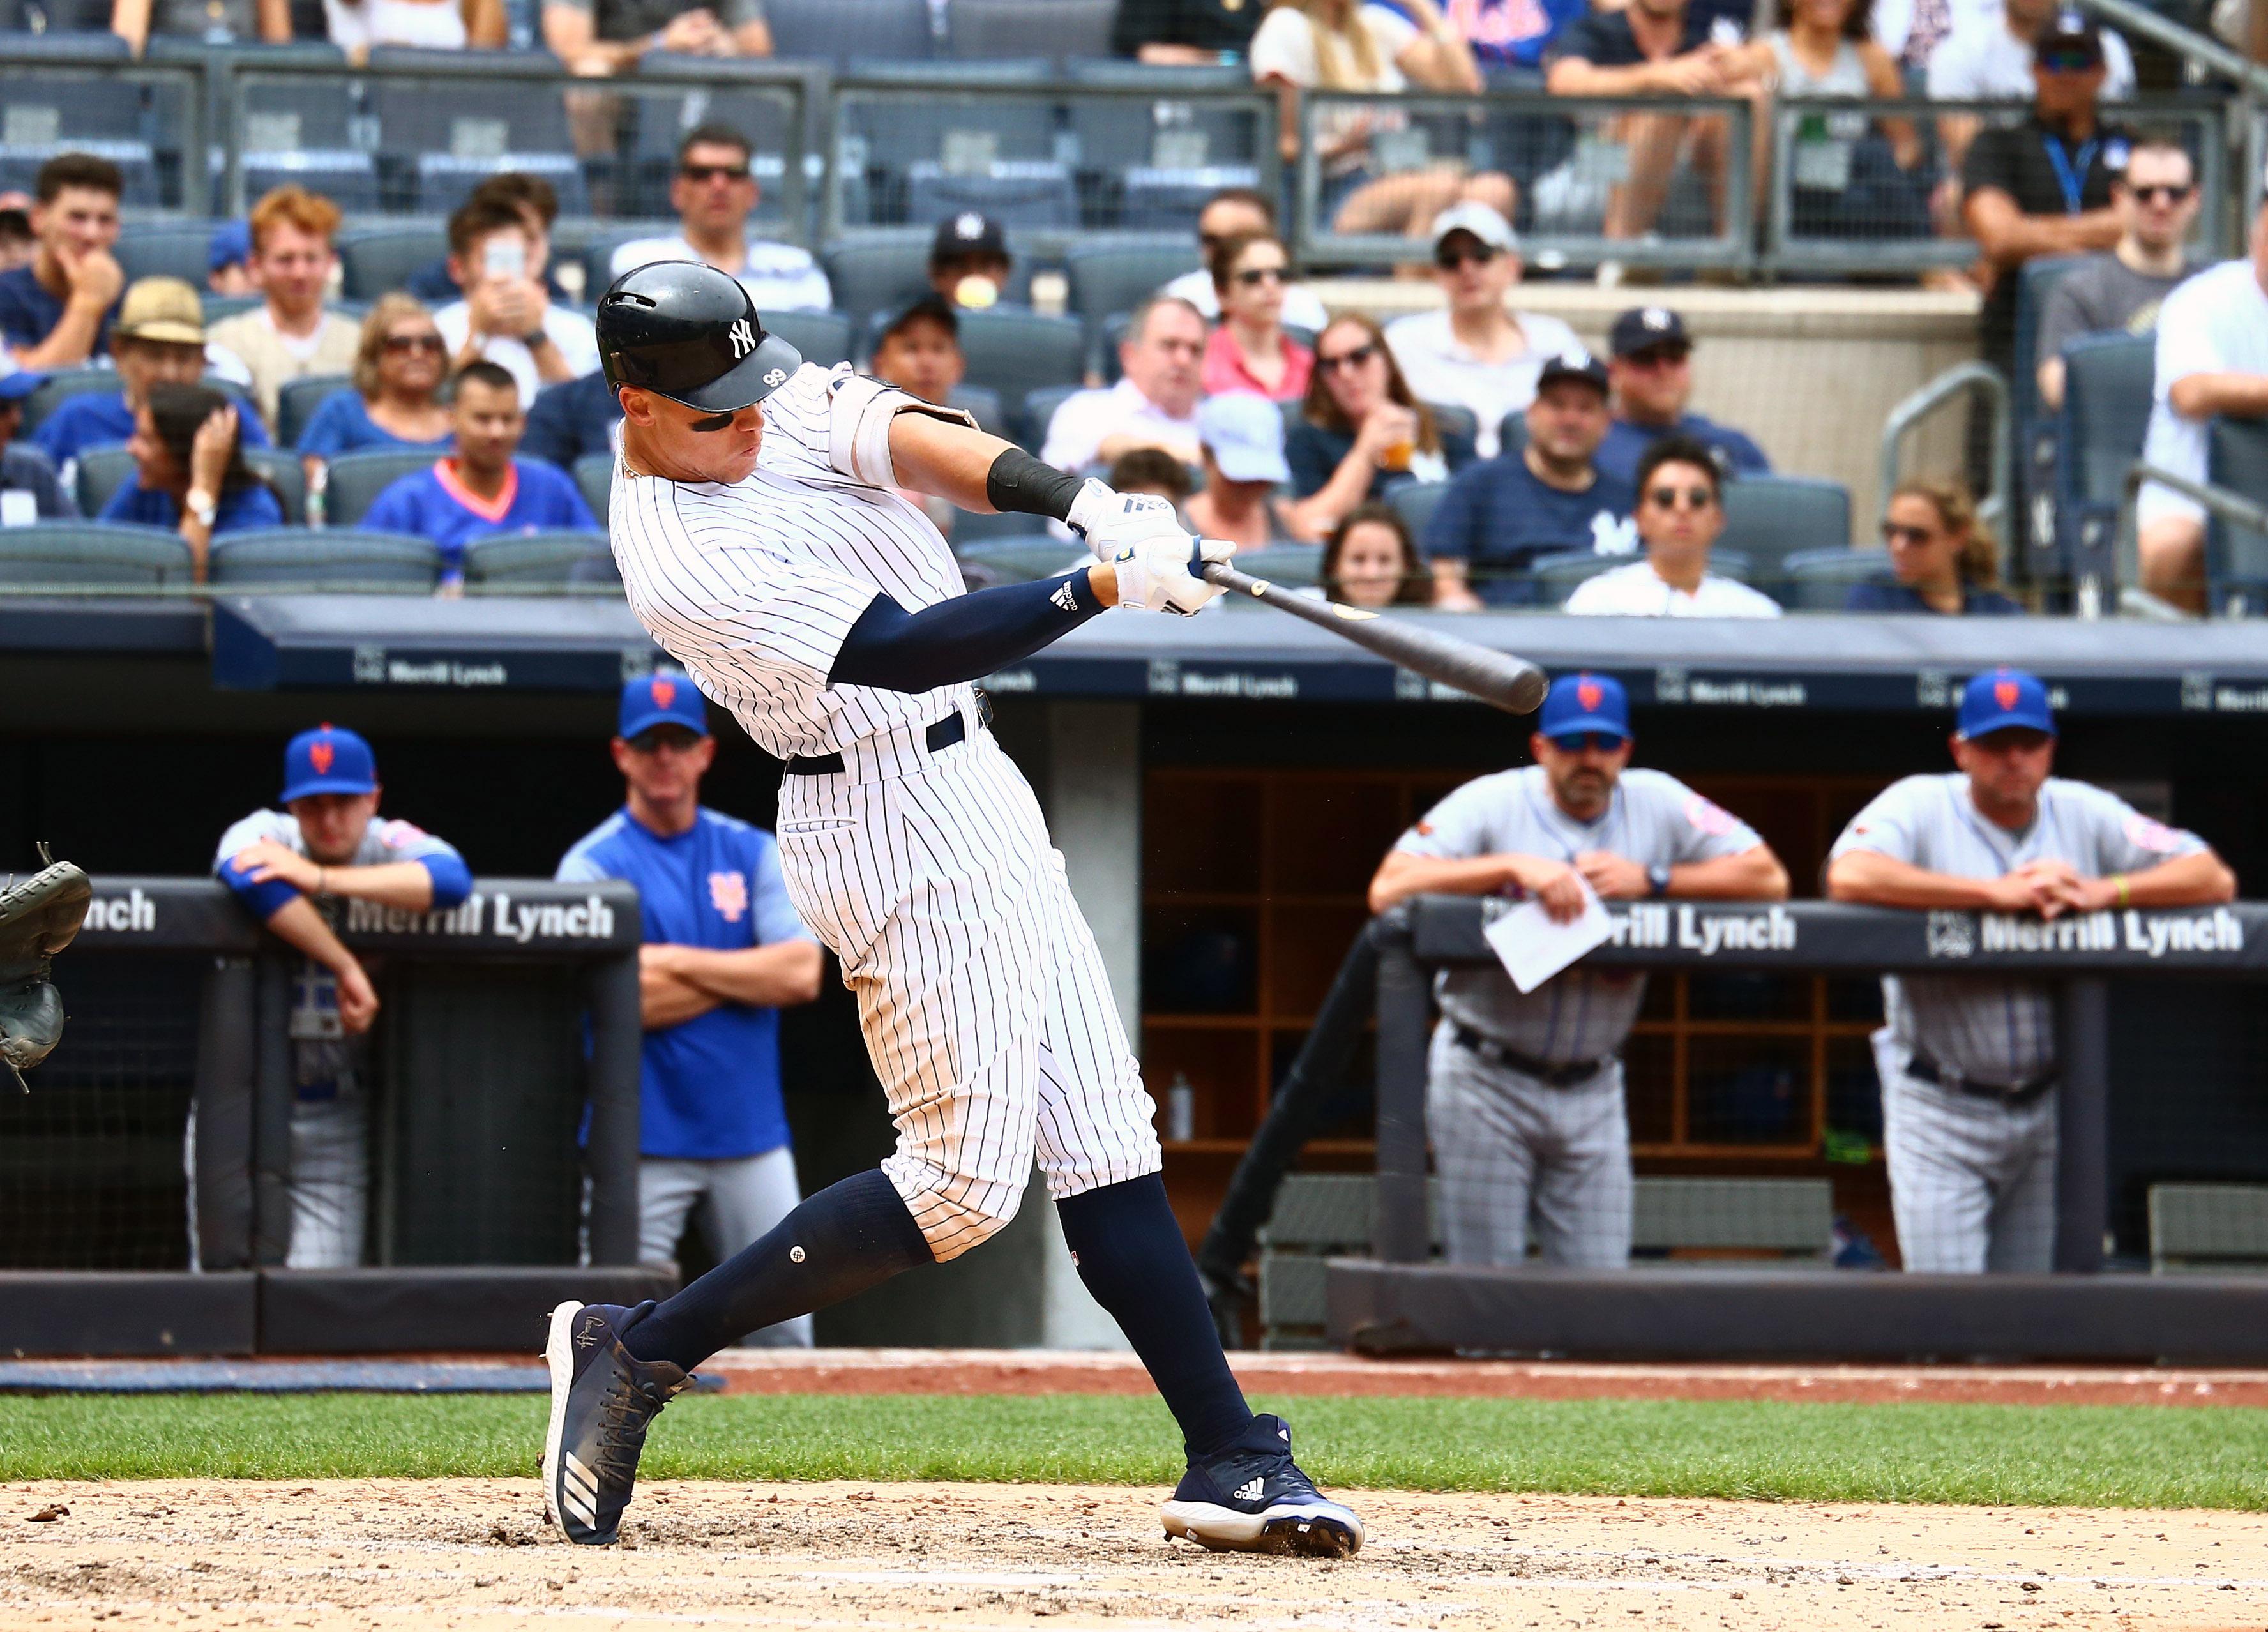 MLB: New York Mets at New York Yankees